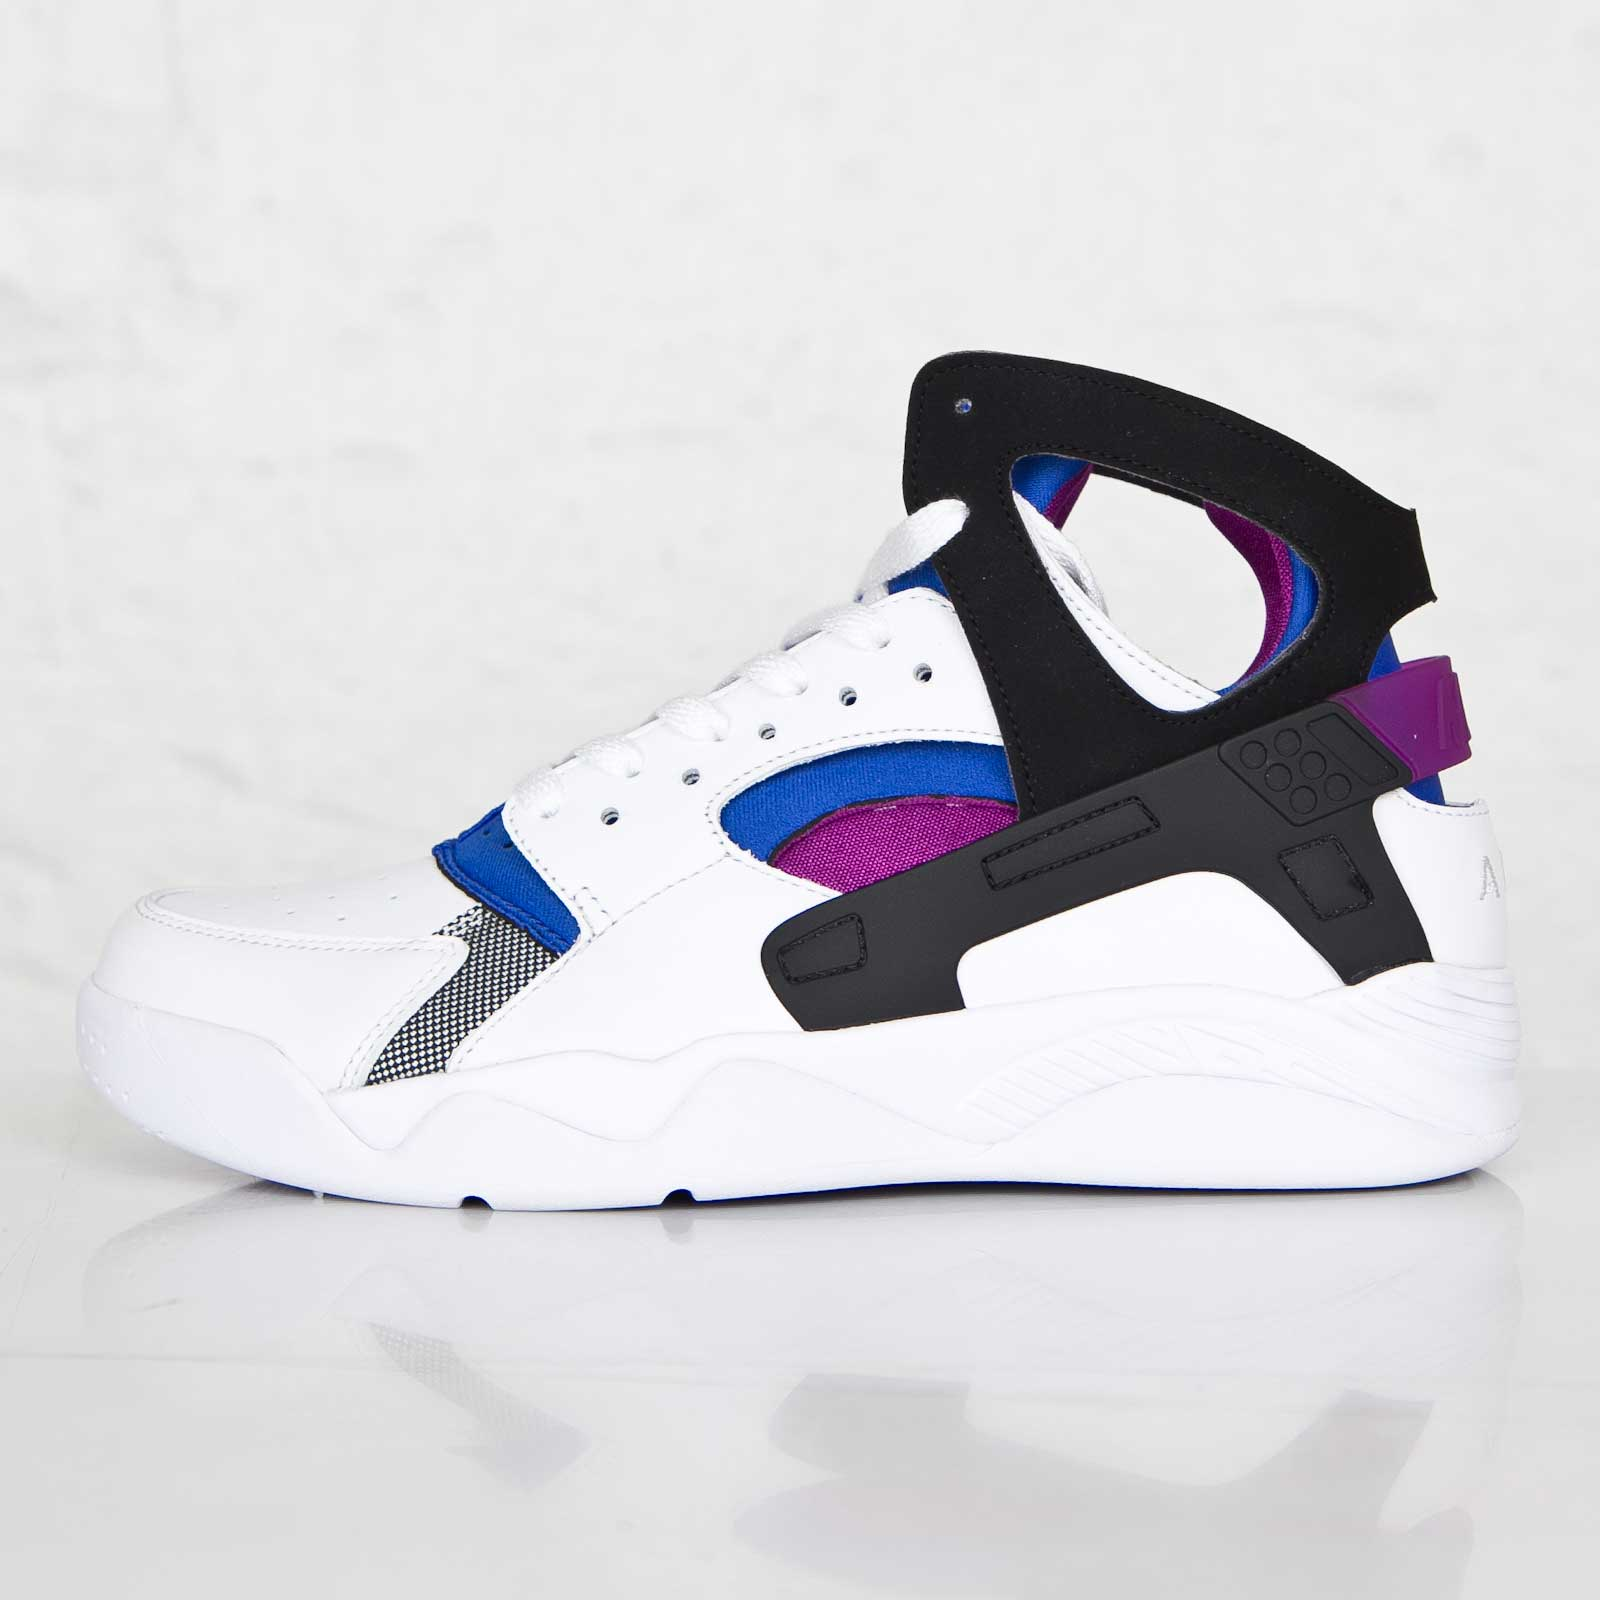 quality design 39d94 2814a Nike Air Flight Huarache Prm QS - 686203-100 - Sneakersnstuff   sneakers    streetwear online since 1999